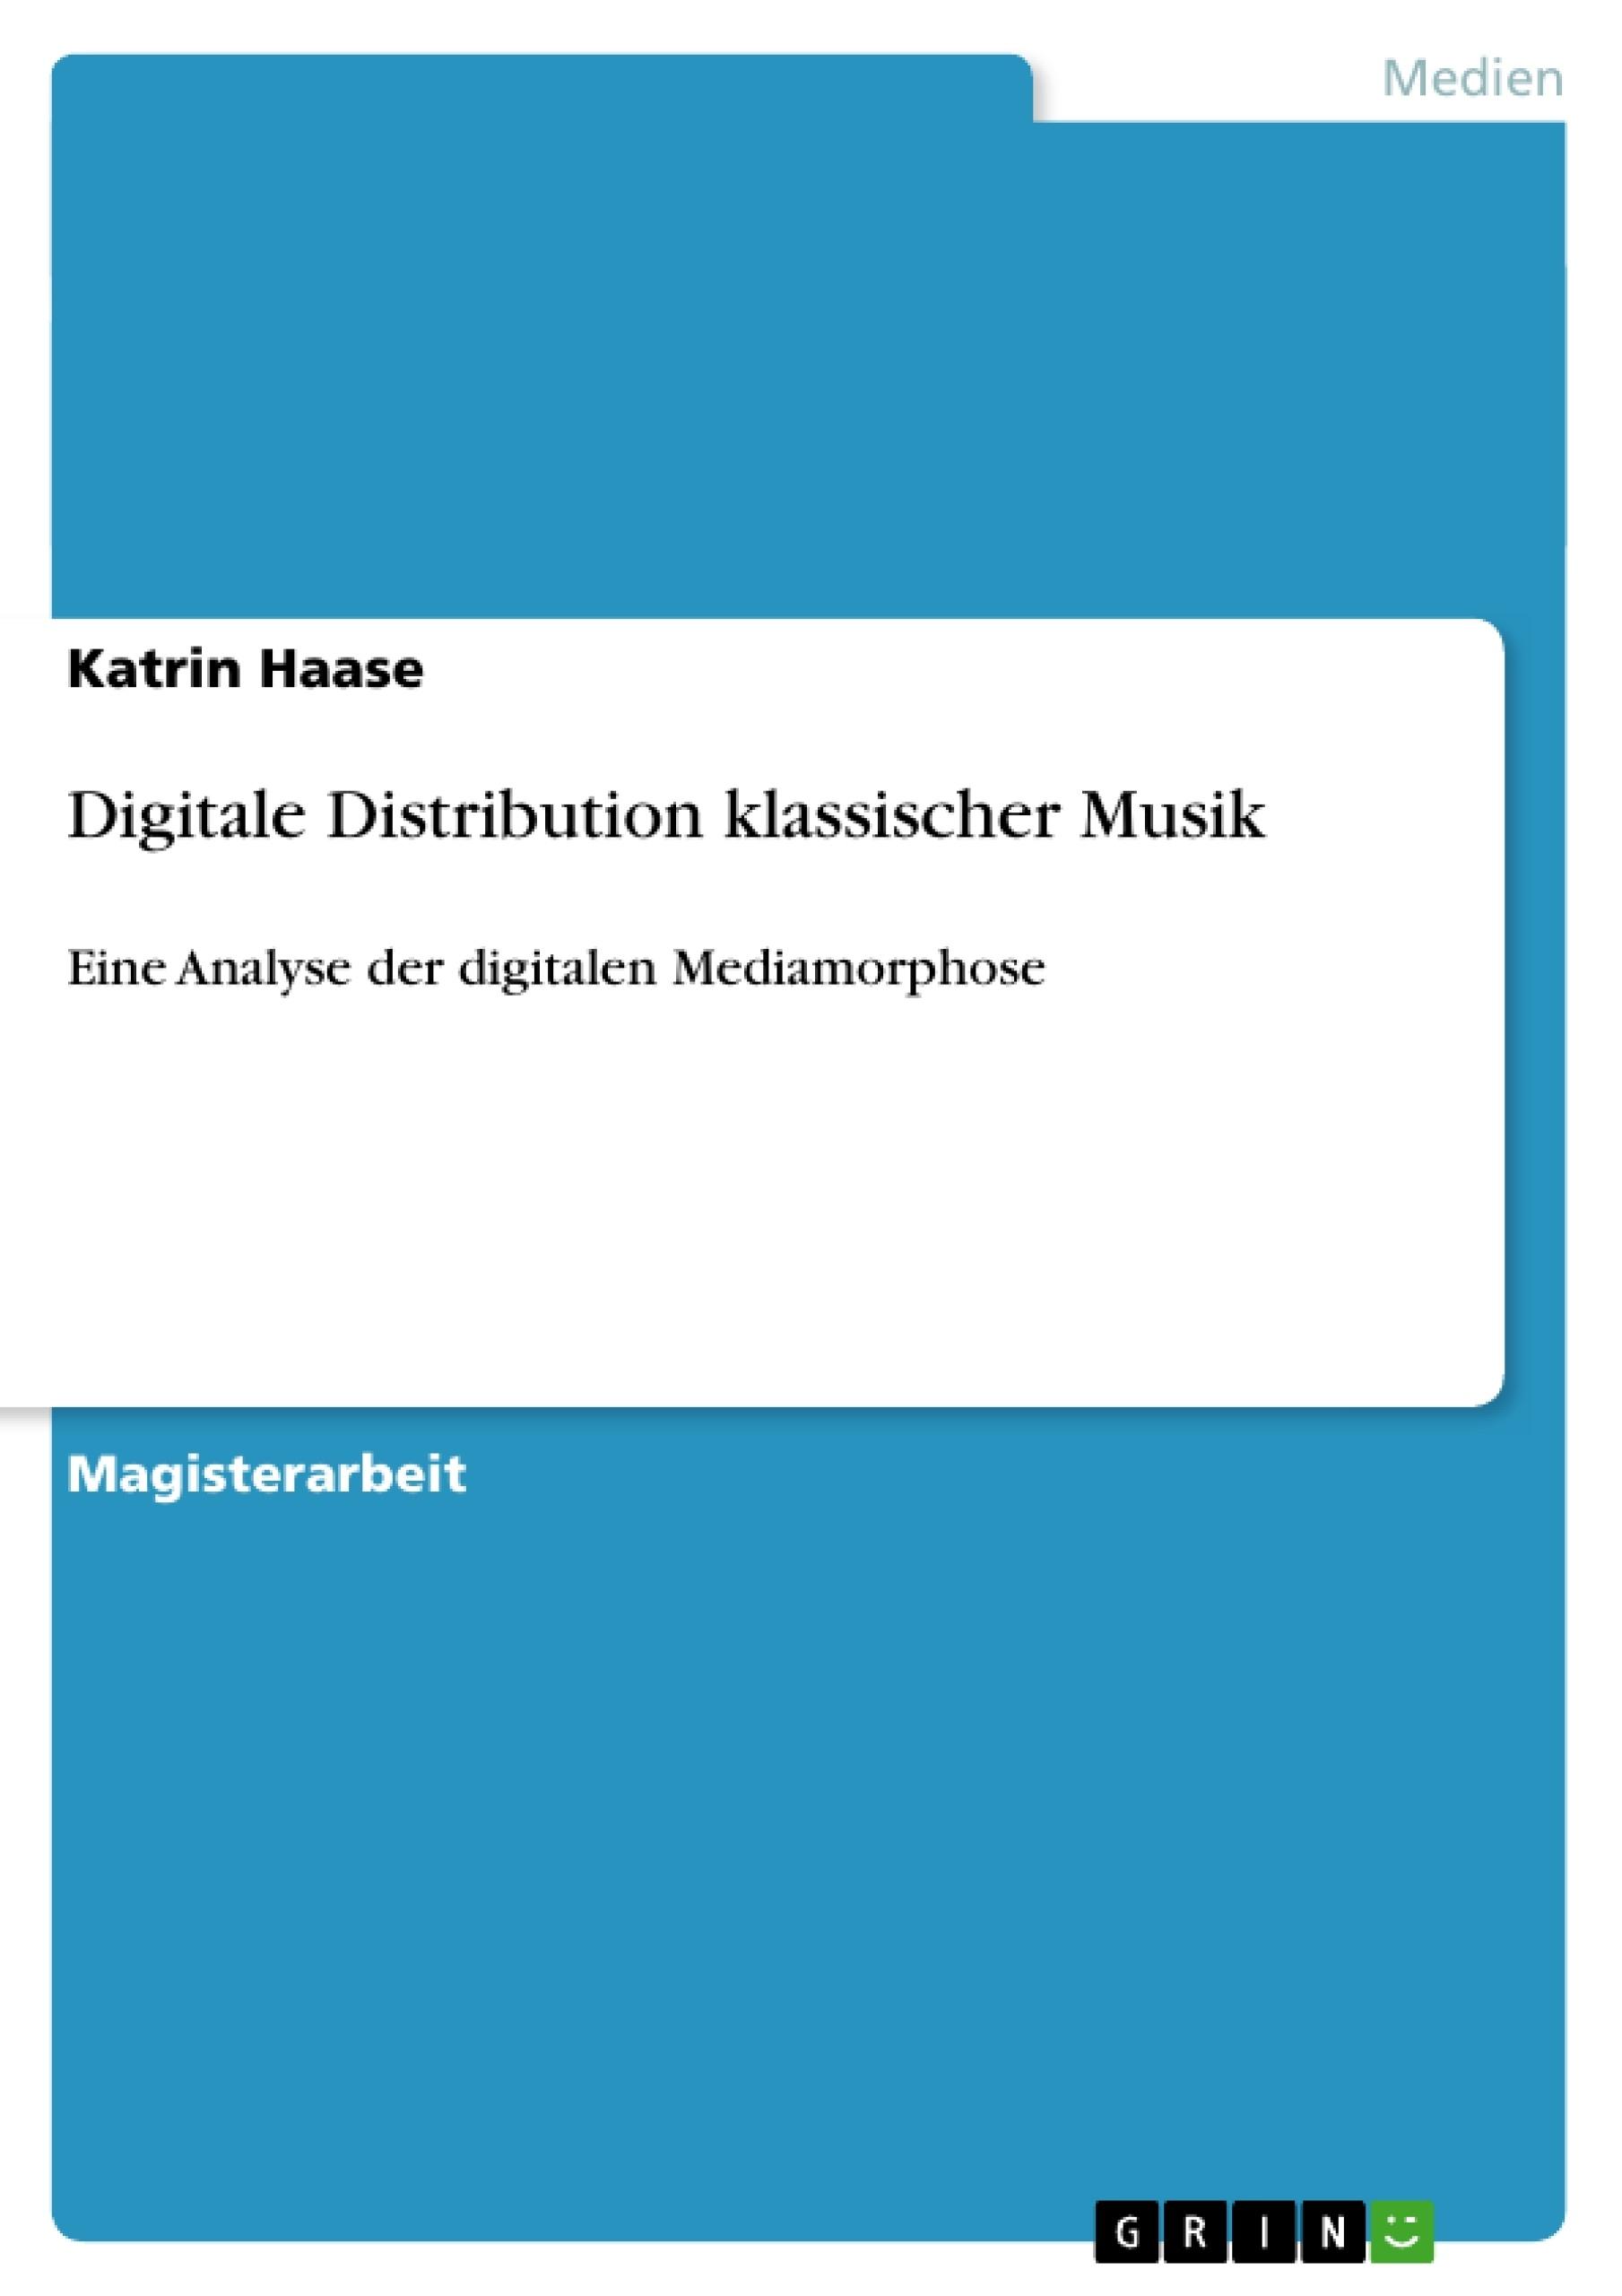 Titel: Digitale Distribution klassischer Musik